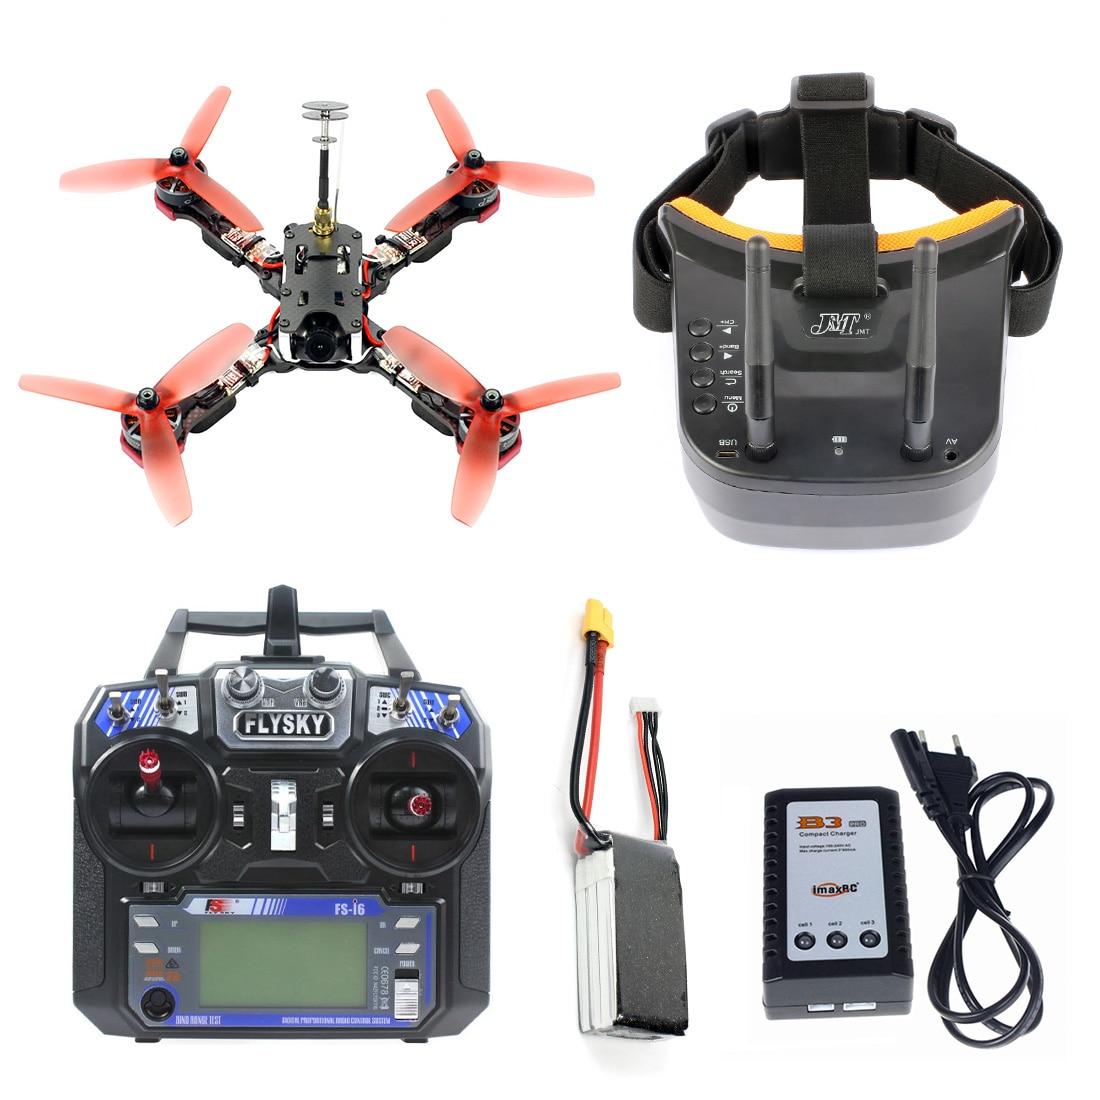 218mm 2.4G 6CH RC Racing Quadcopter RTF Betaflight F4 Pro V2 BLHeli-s 30A 5.8G 25/200/400mW VTX Mini 700TVL Camera FPV Drone